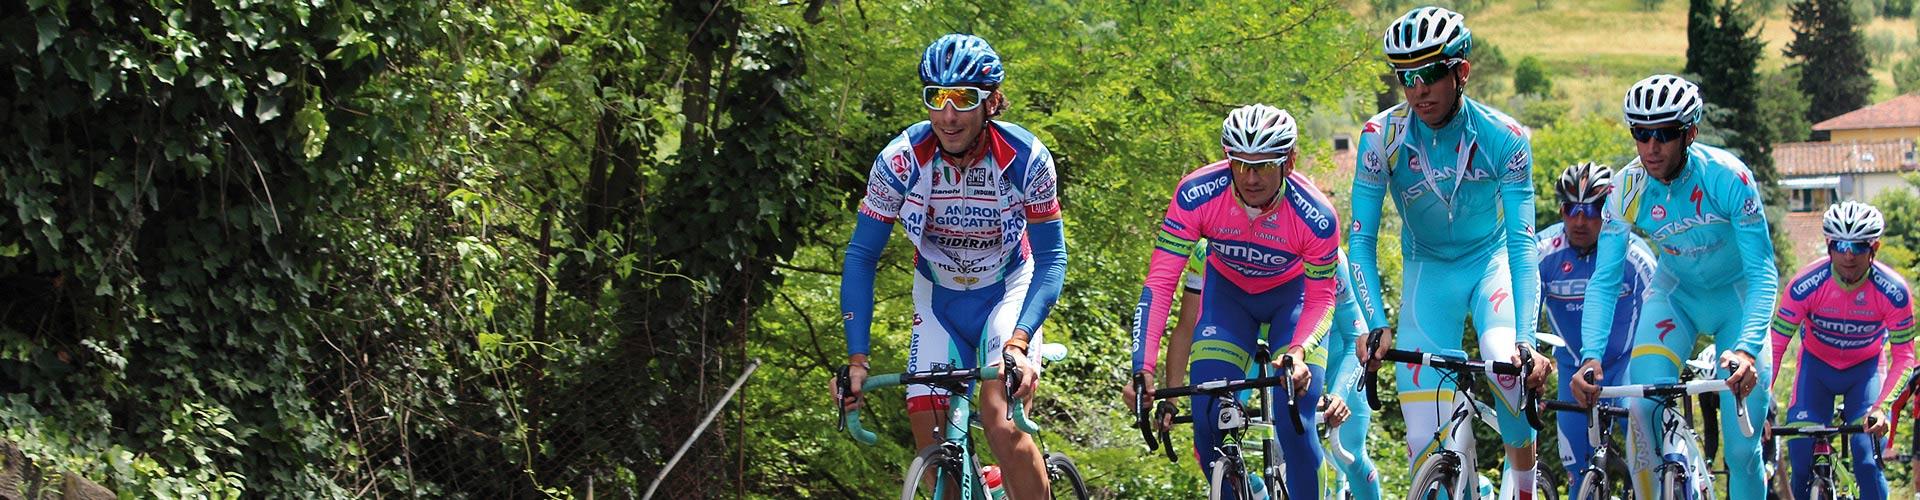 Lamporecchio-land of cycling